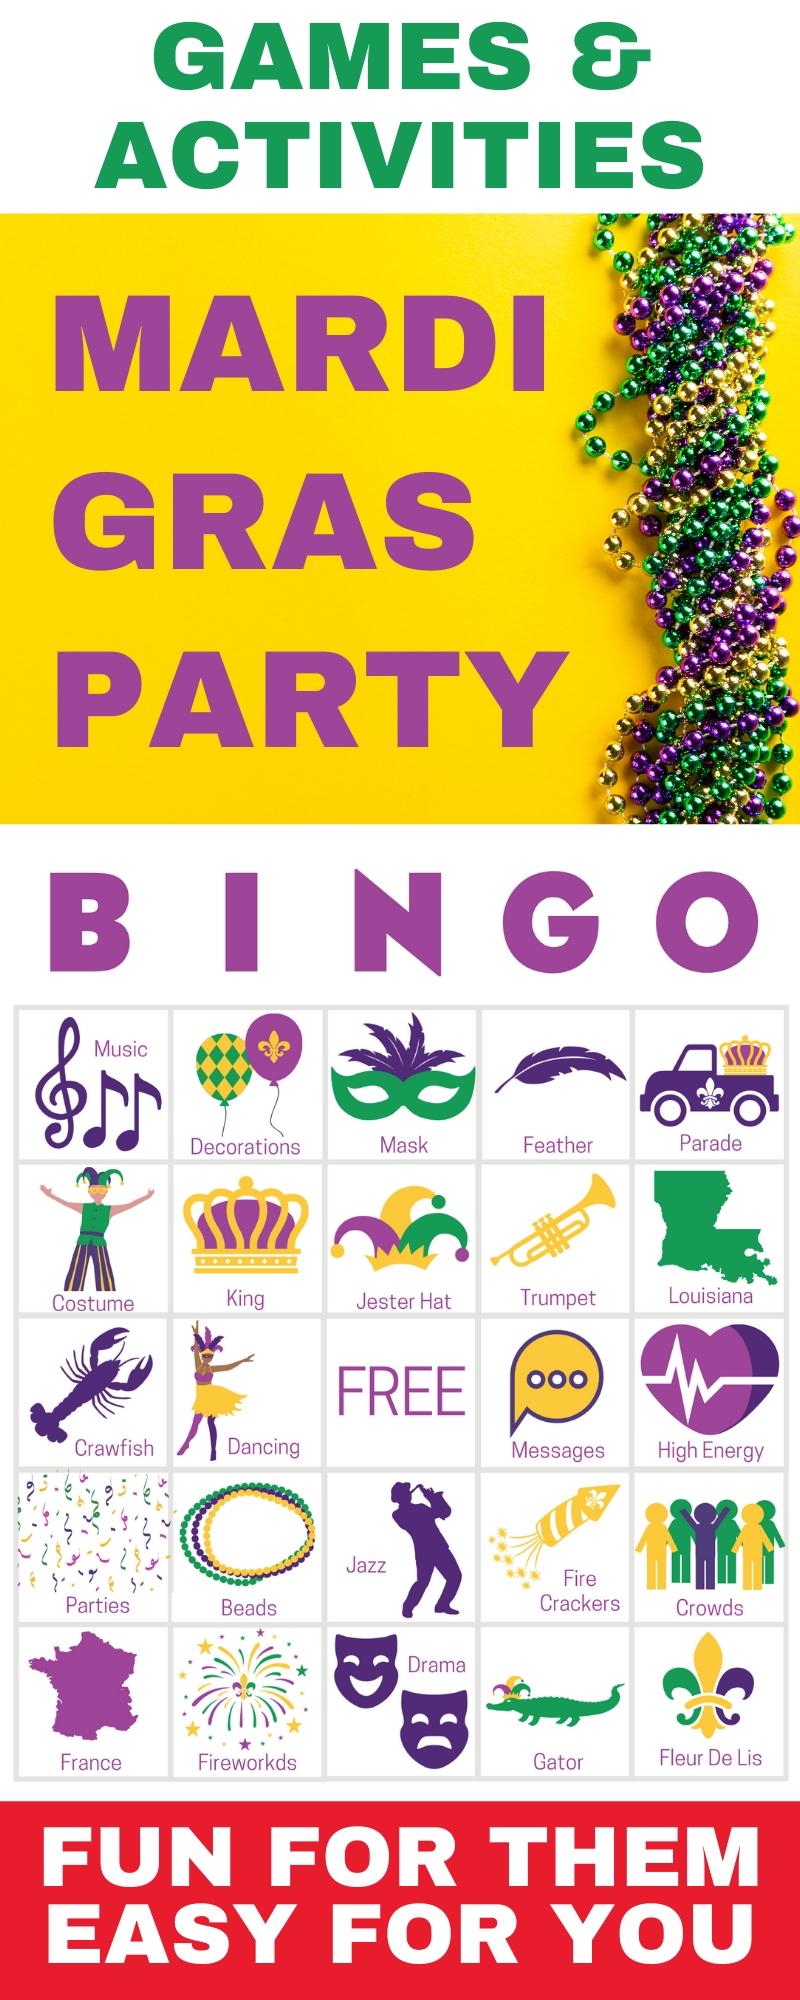 Mardi Gras Party Games - Easy, Modern & Hilarious Fun